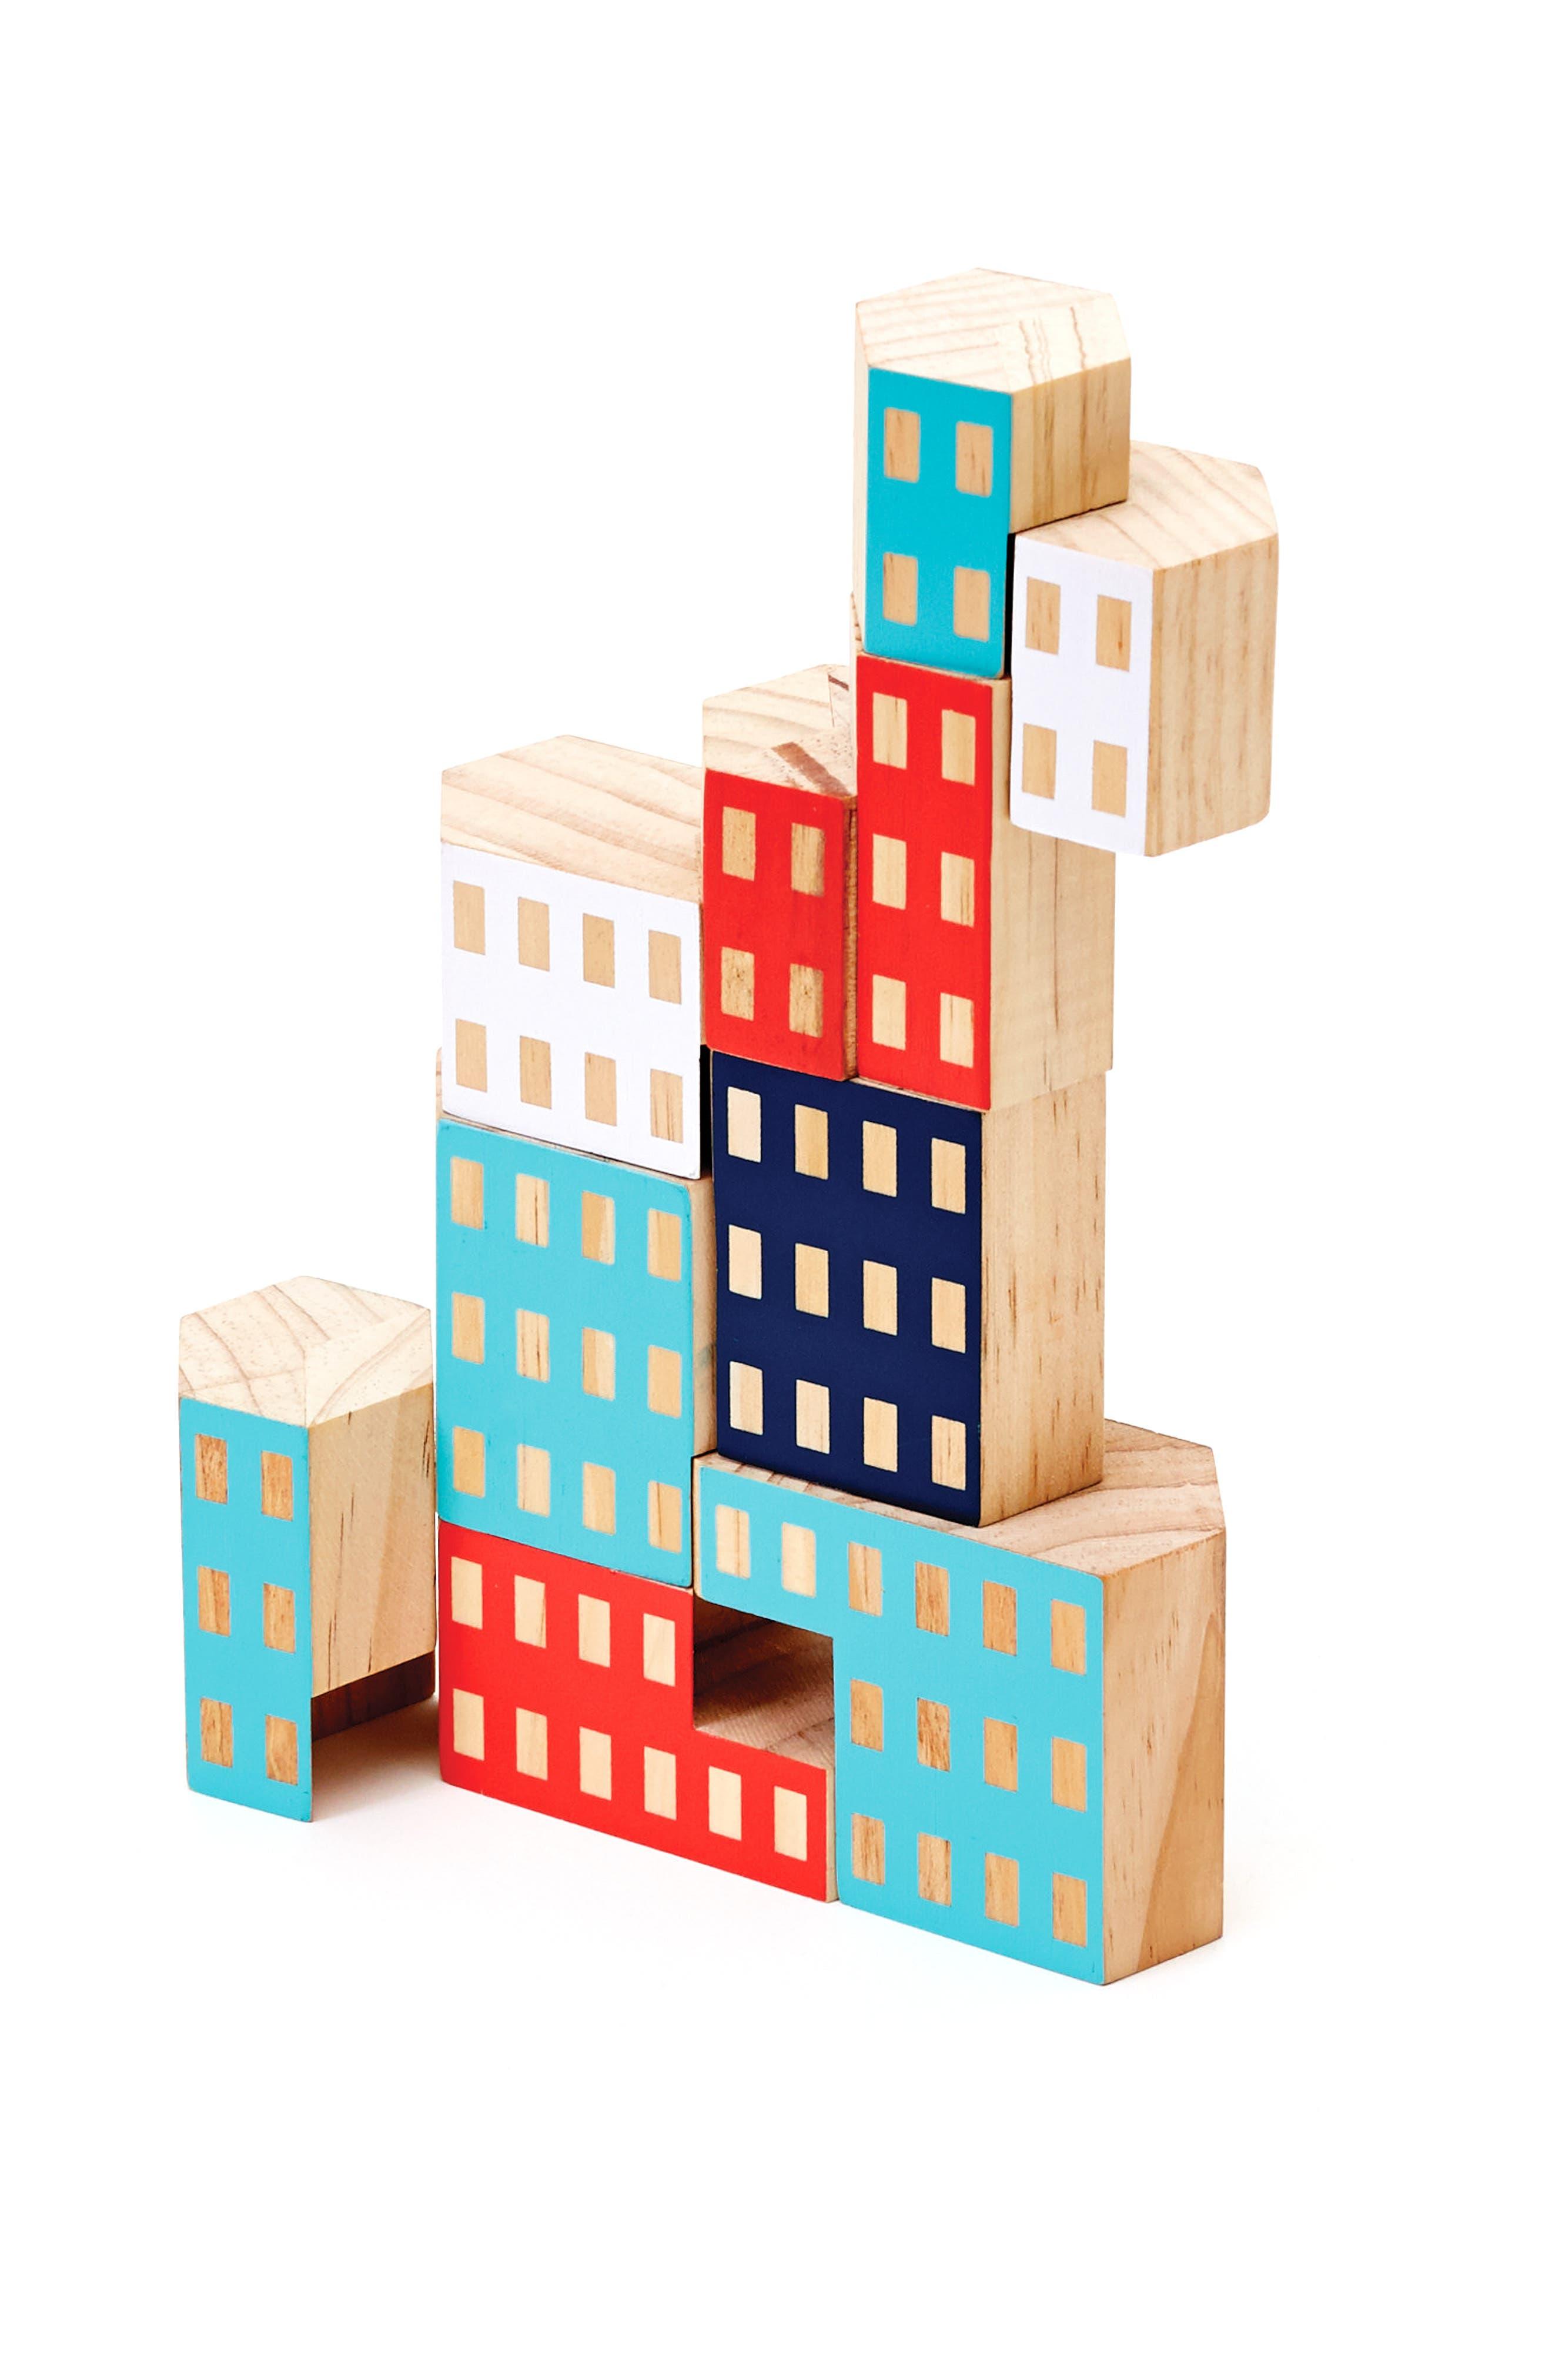 Areaware Blockitecture Habitat 10-Piece Wooden Block Set